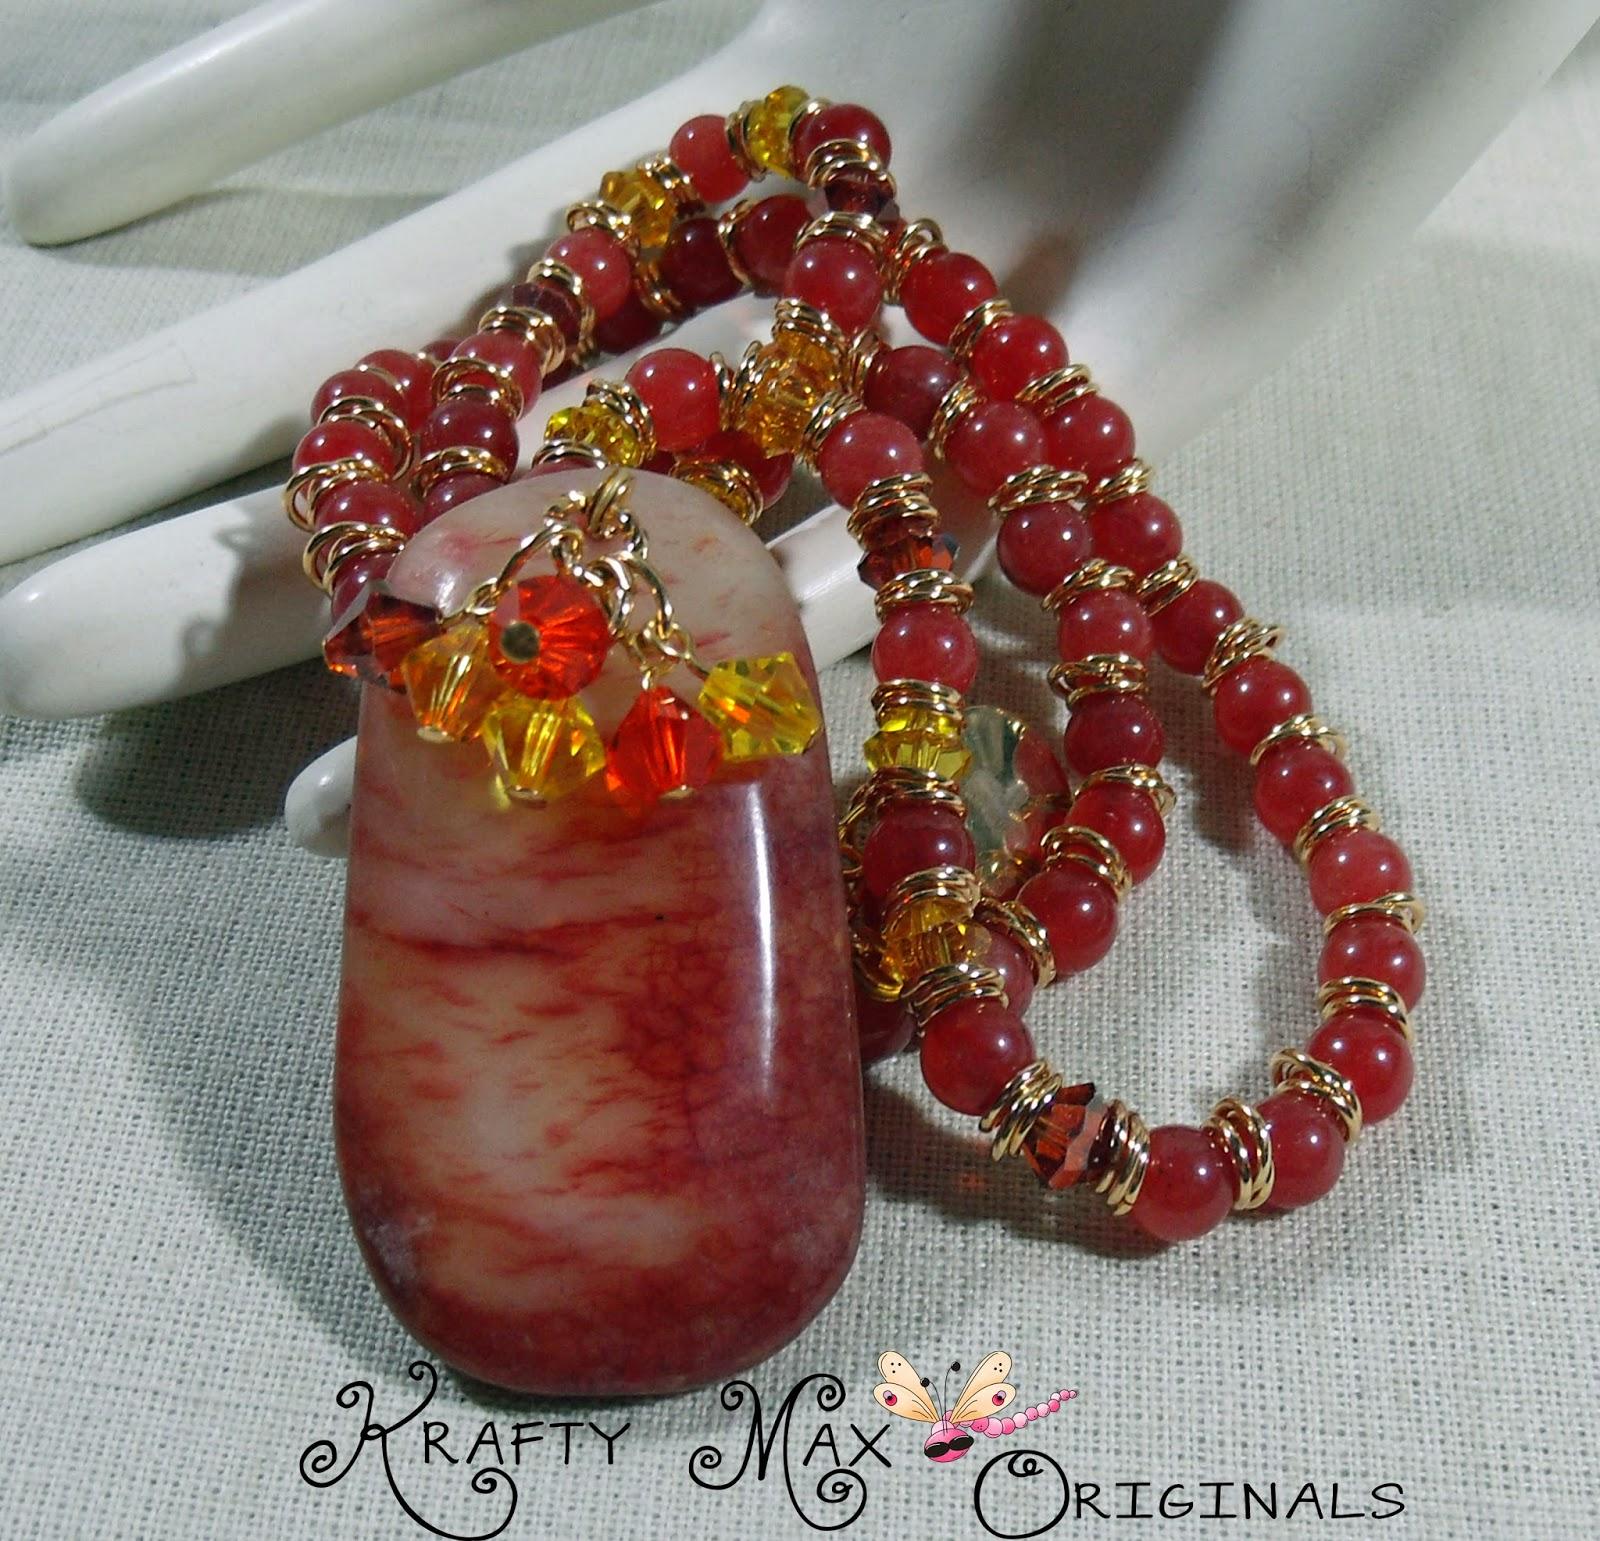 http://www.lajuliet.com/index.php/sell/ad/gemstone,92/exclusive-bloodstone-and-swarovski-crystal-golden-necklace-set-a-krafty-max-original-design,143